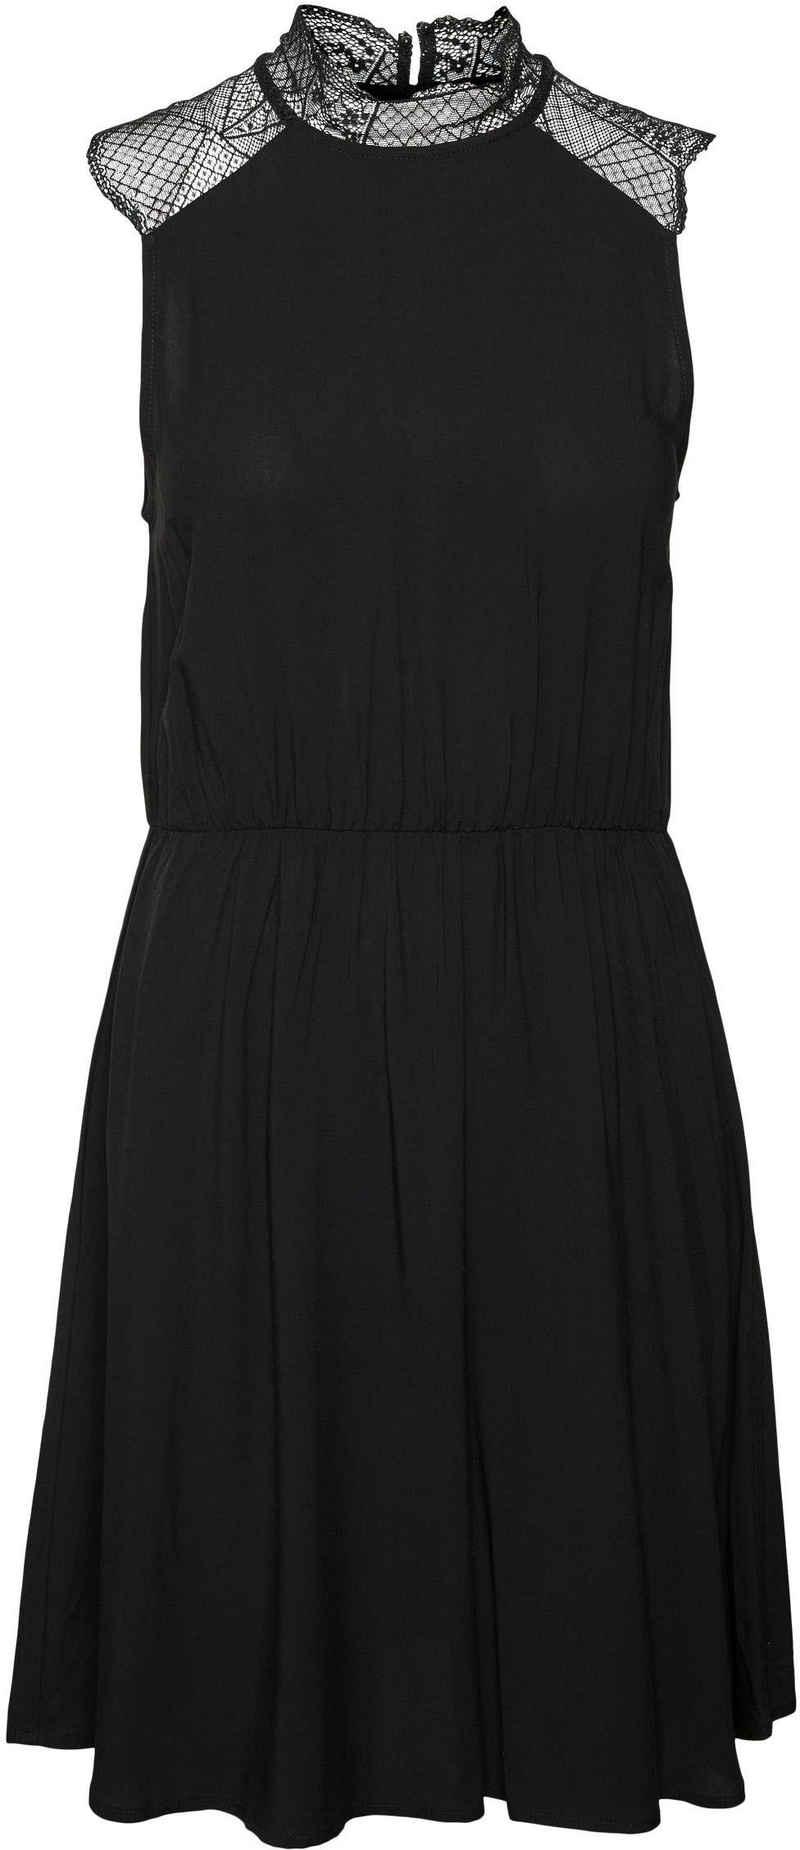 Vero Moda Spitzenkleid »VMBONI SL DRESS«